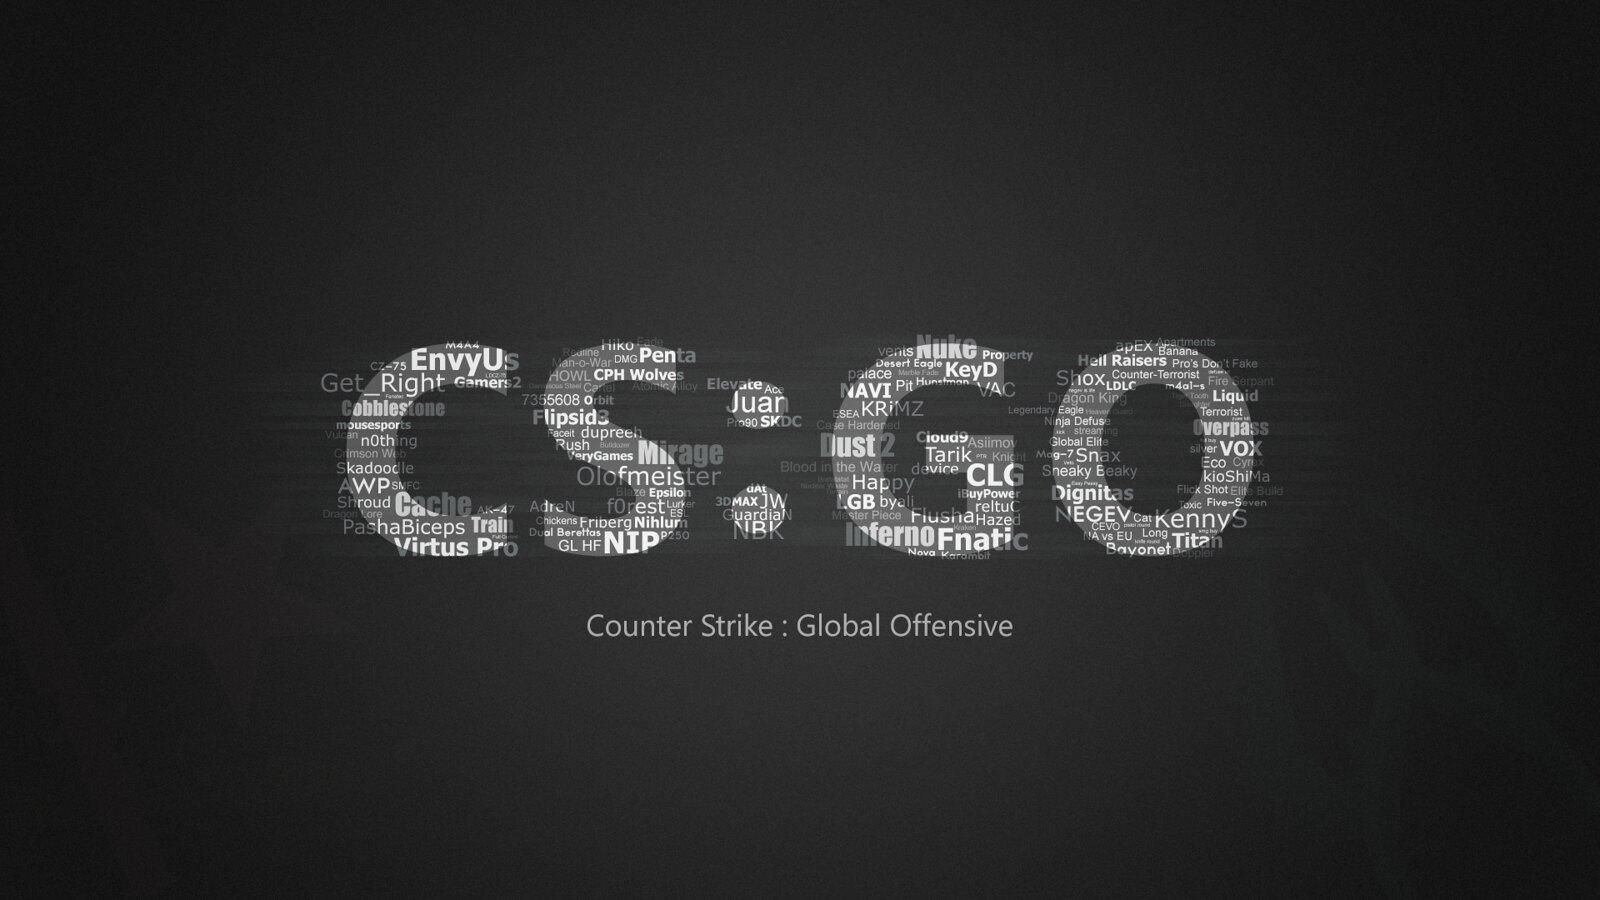 Cs Go Csgo Wallpaper Hd Bindy Johal Flickr